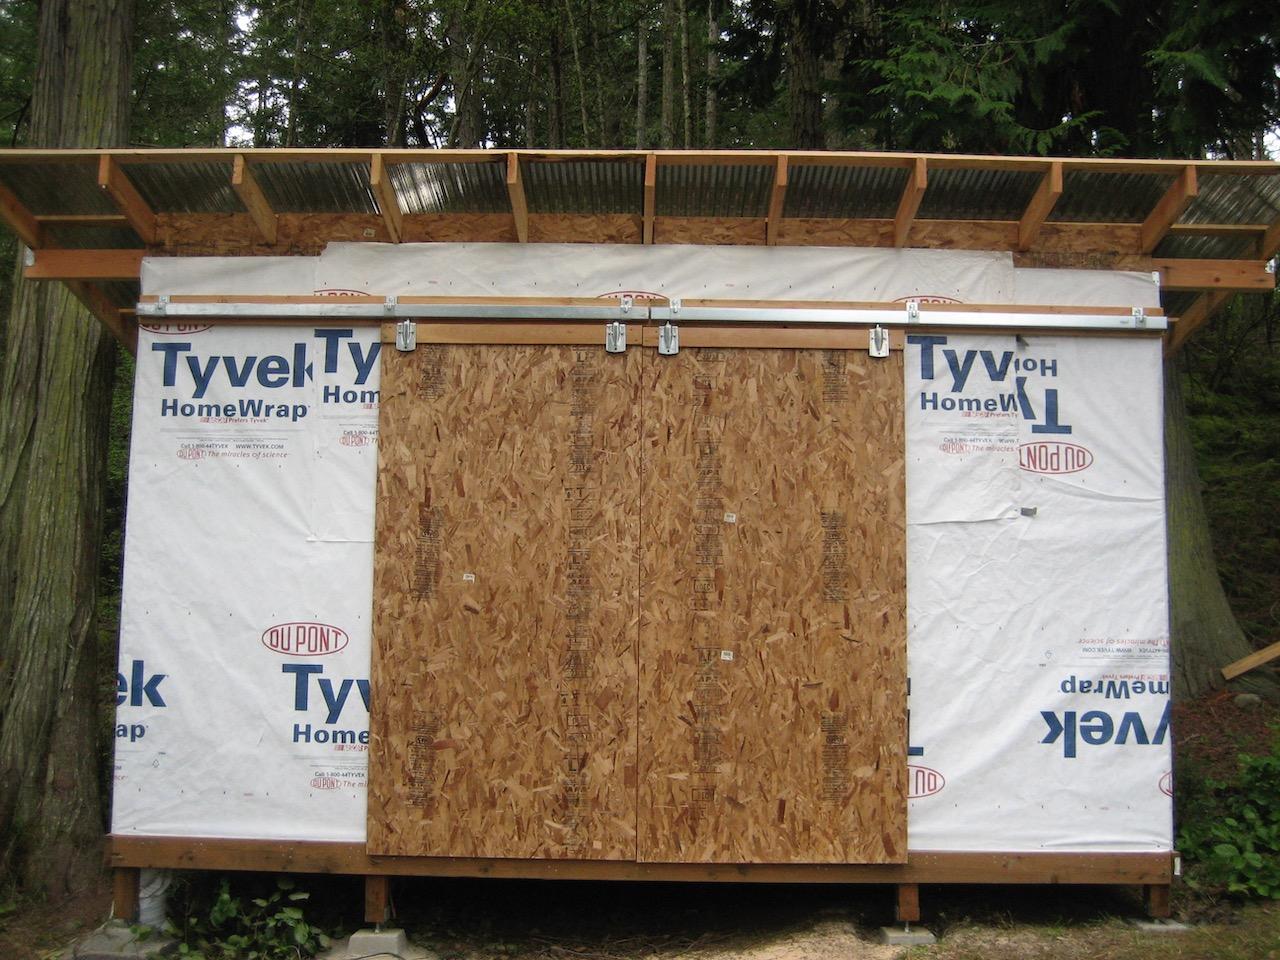 Two 4x8 strand board sliding doors